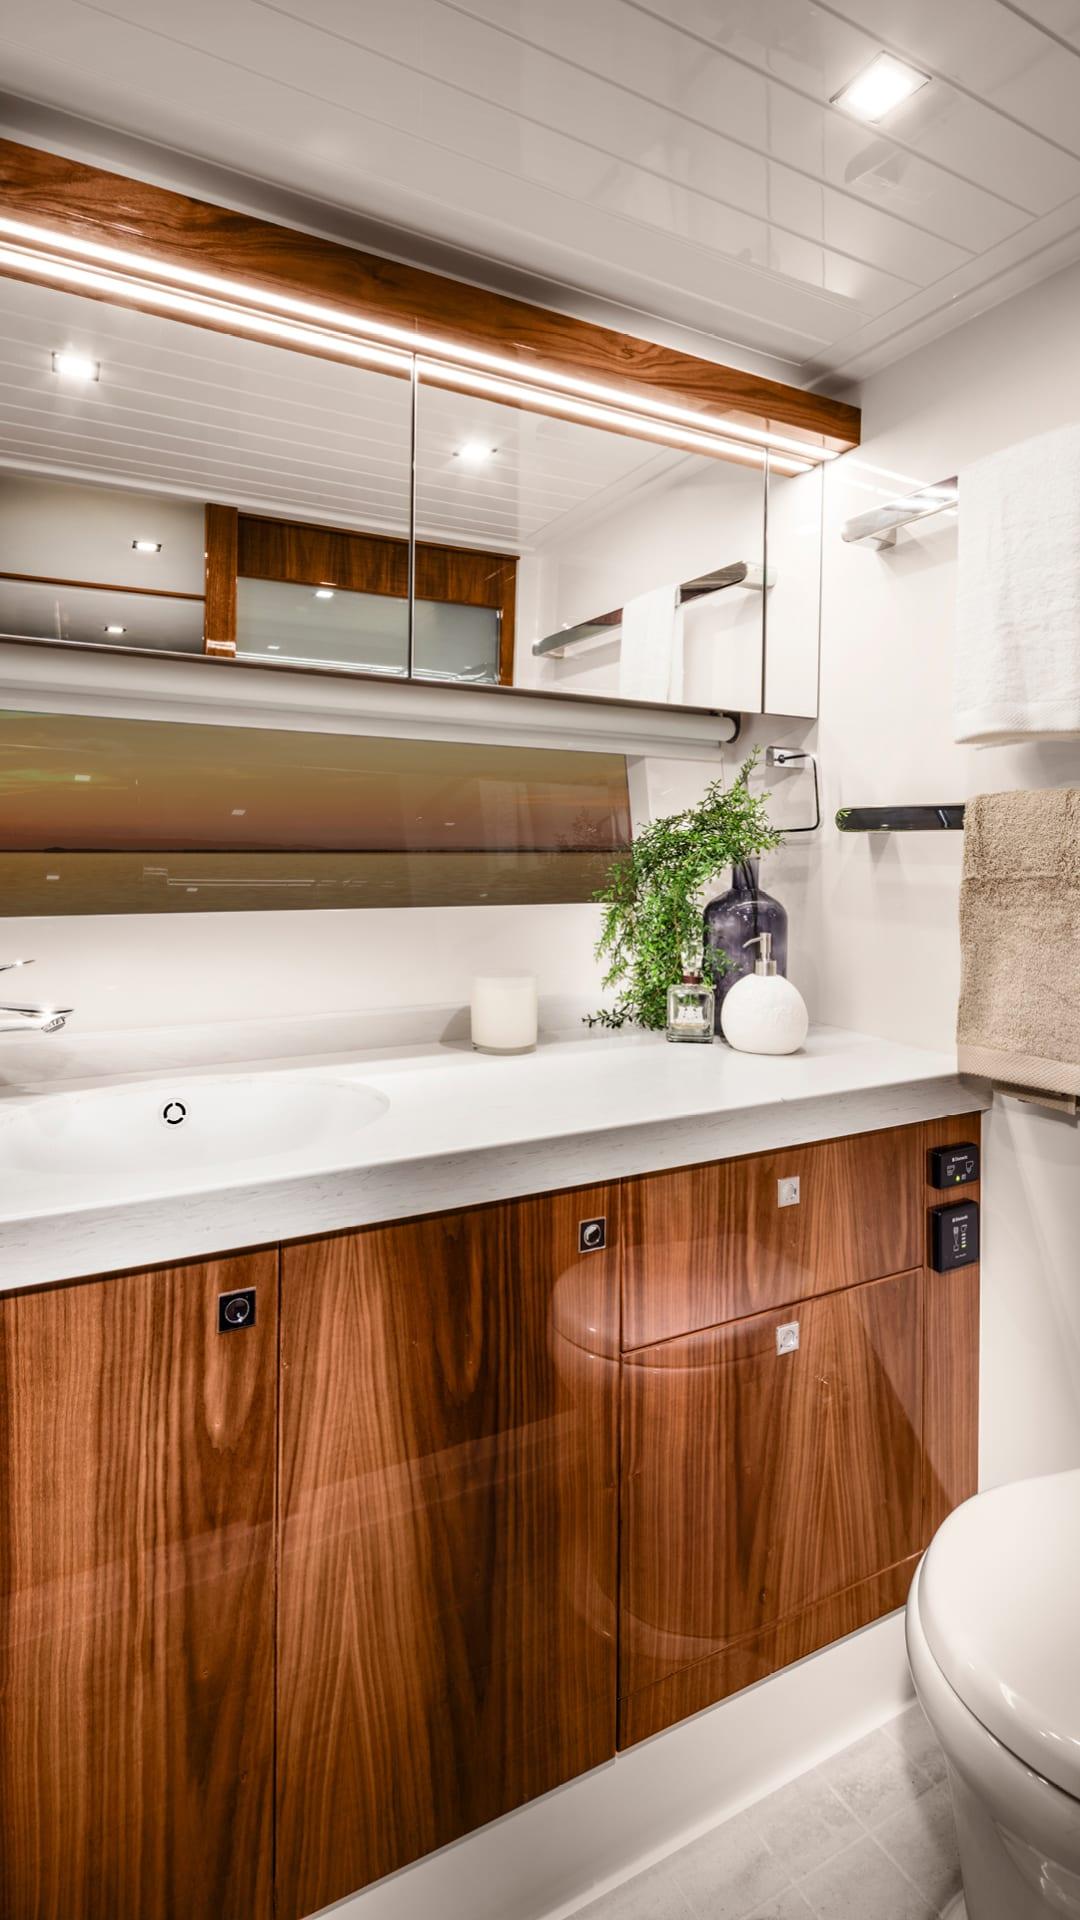 Riviera 72 Sports Motor Yacht Classic Master Ensuite 01 – Gloss Walnut Timber Finish